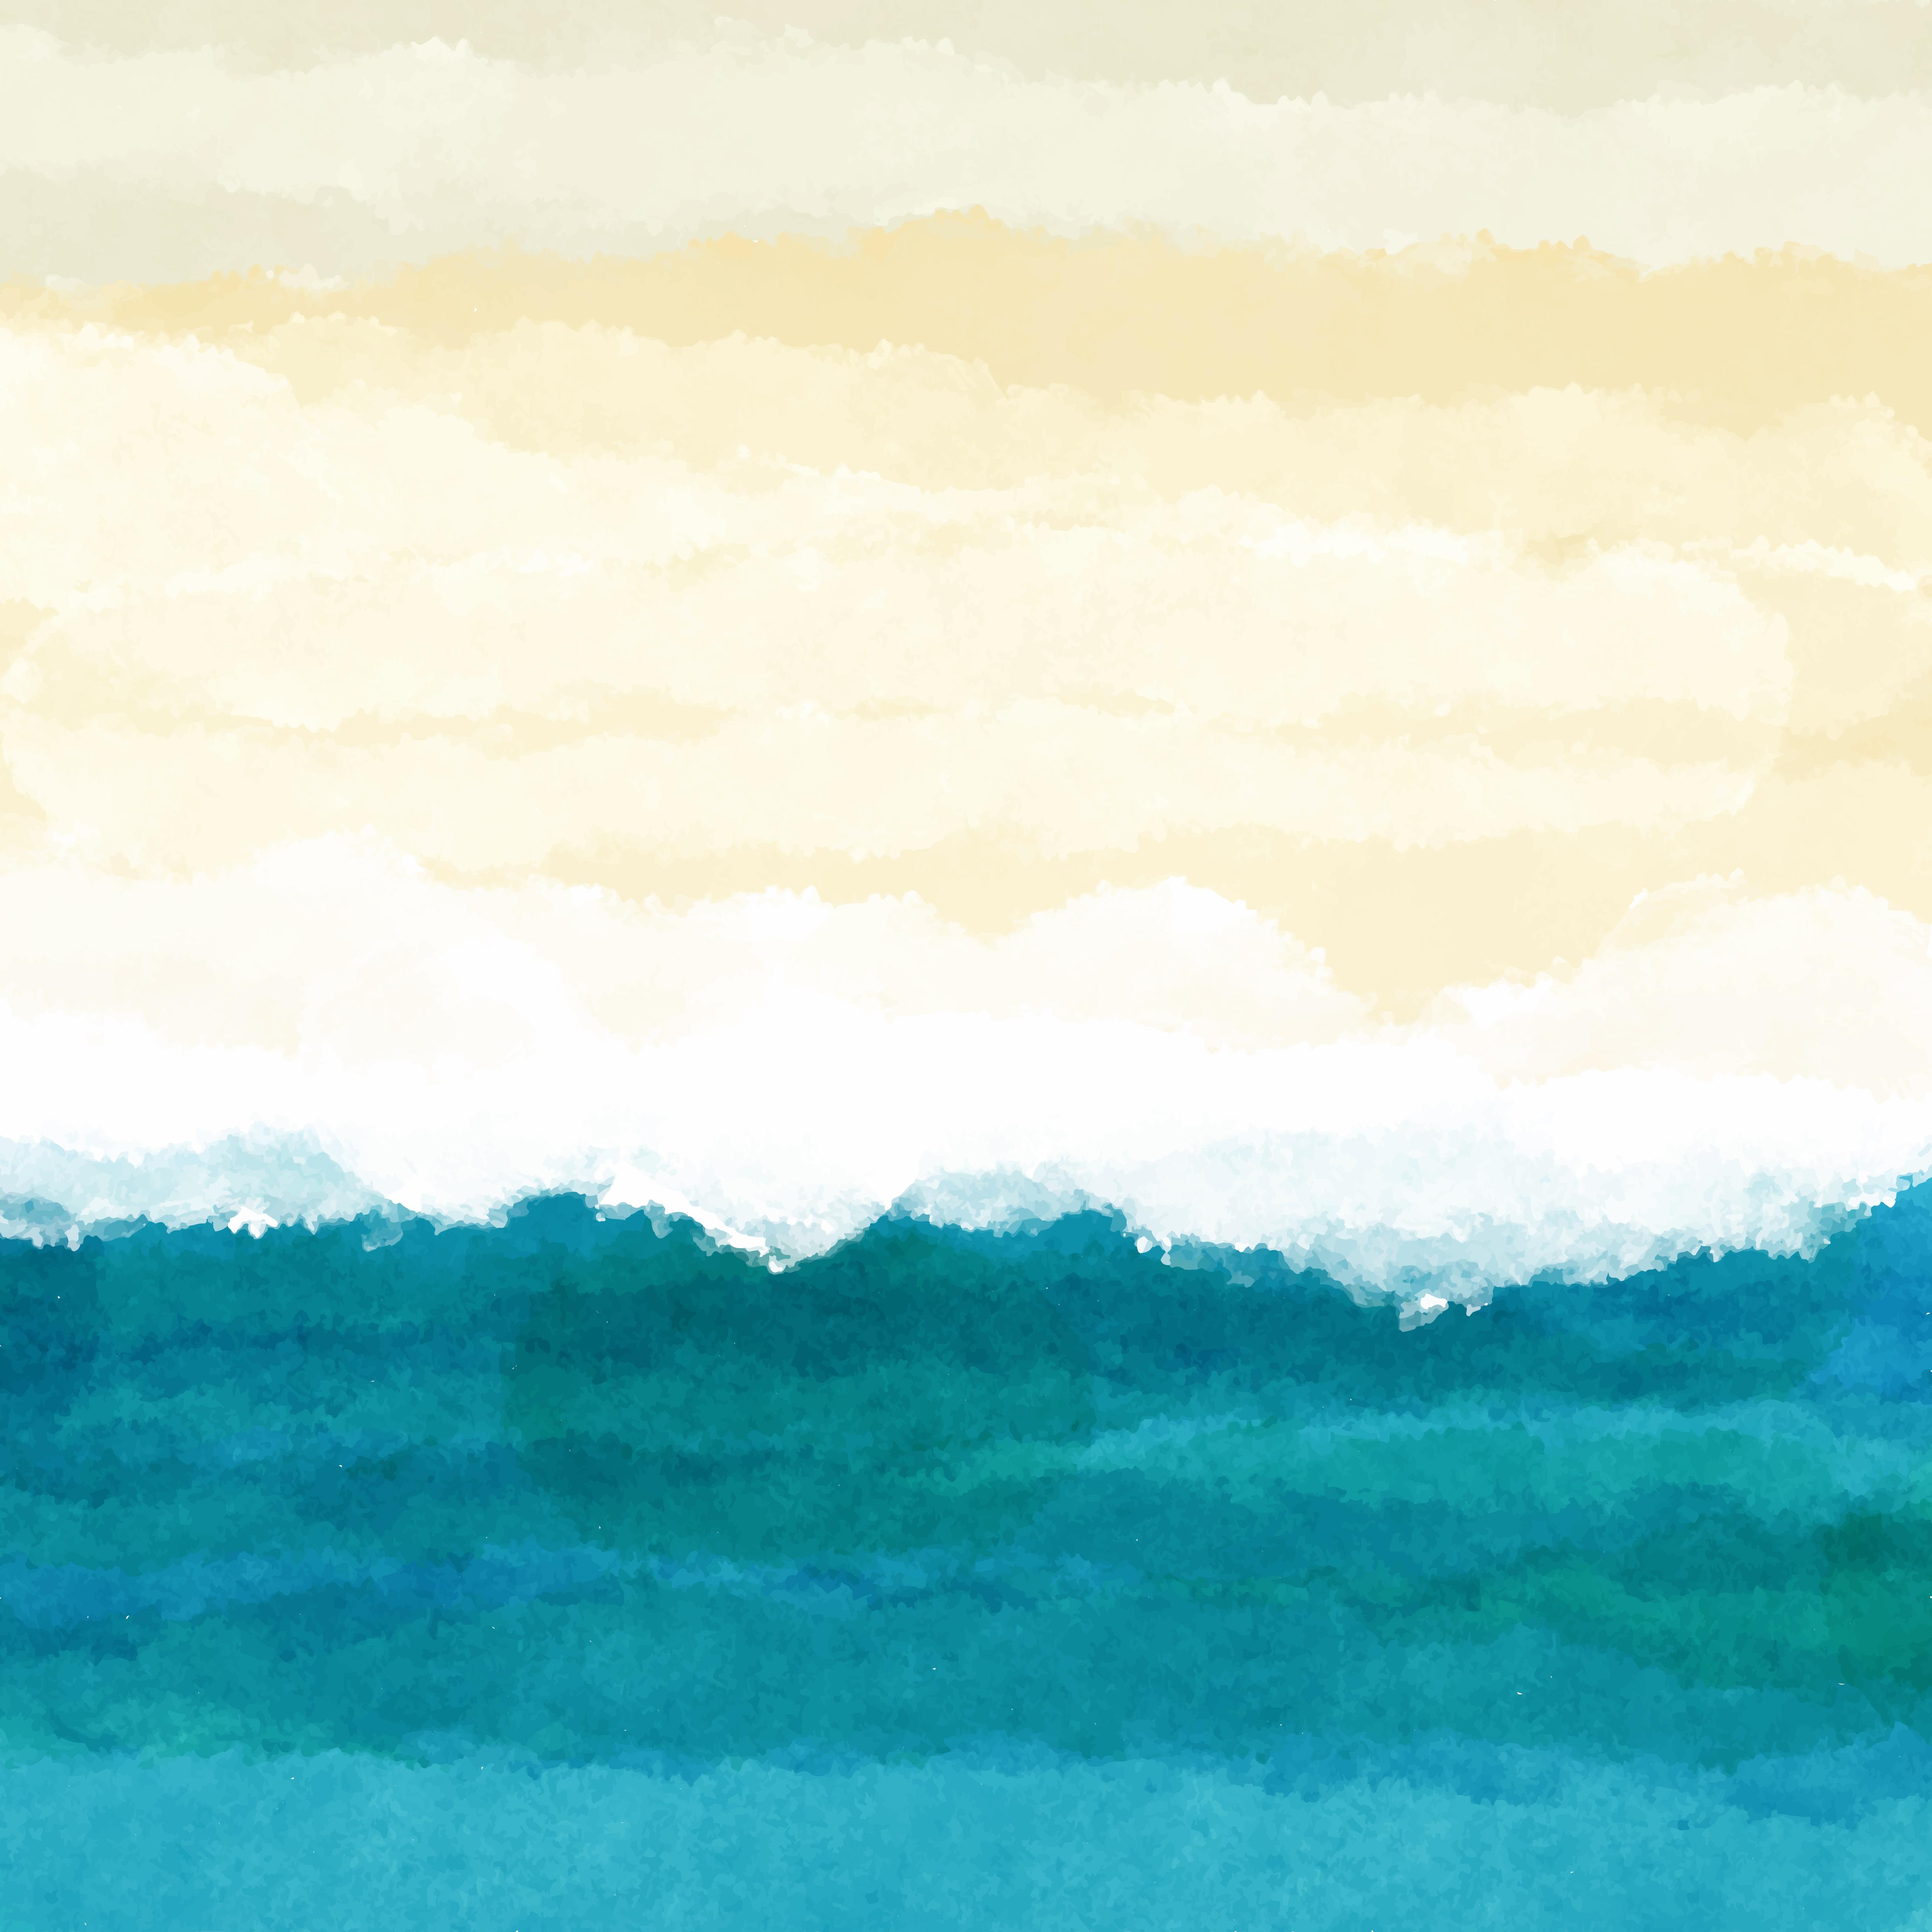 Watercolour Beach Scene Free